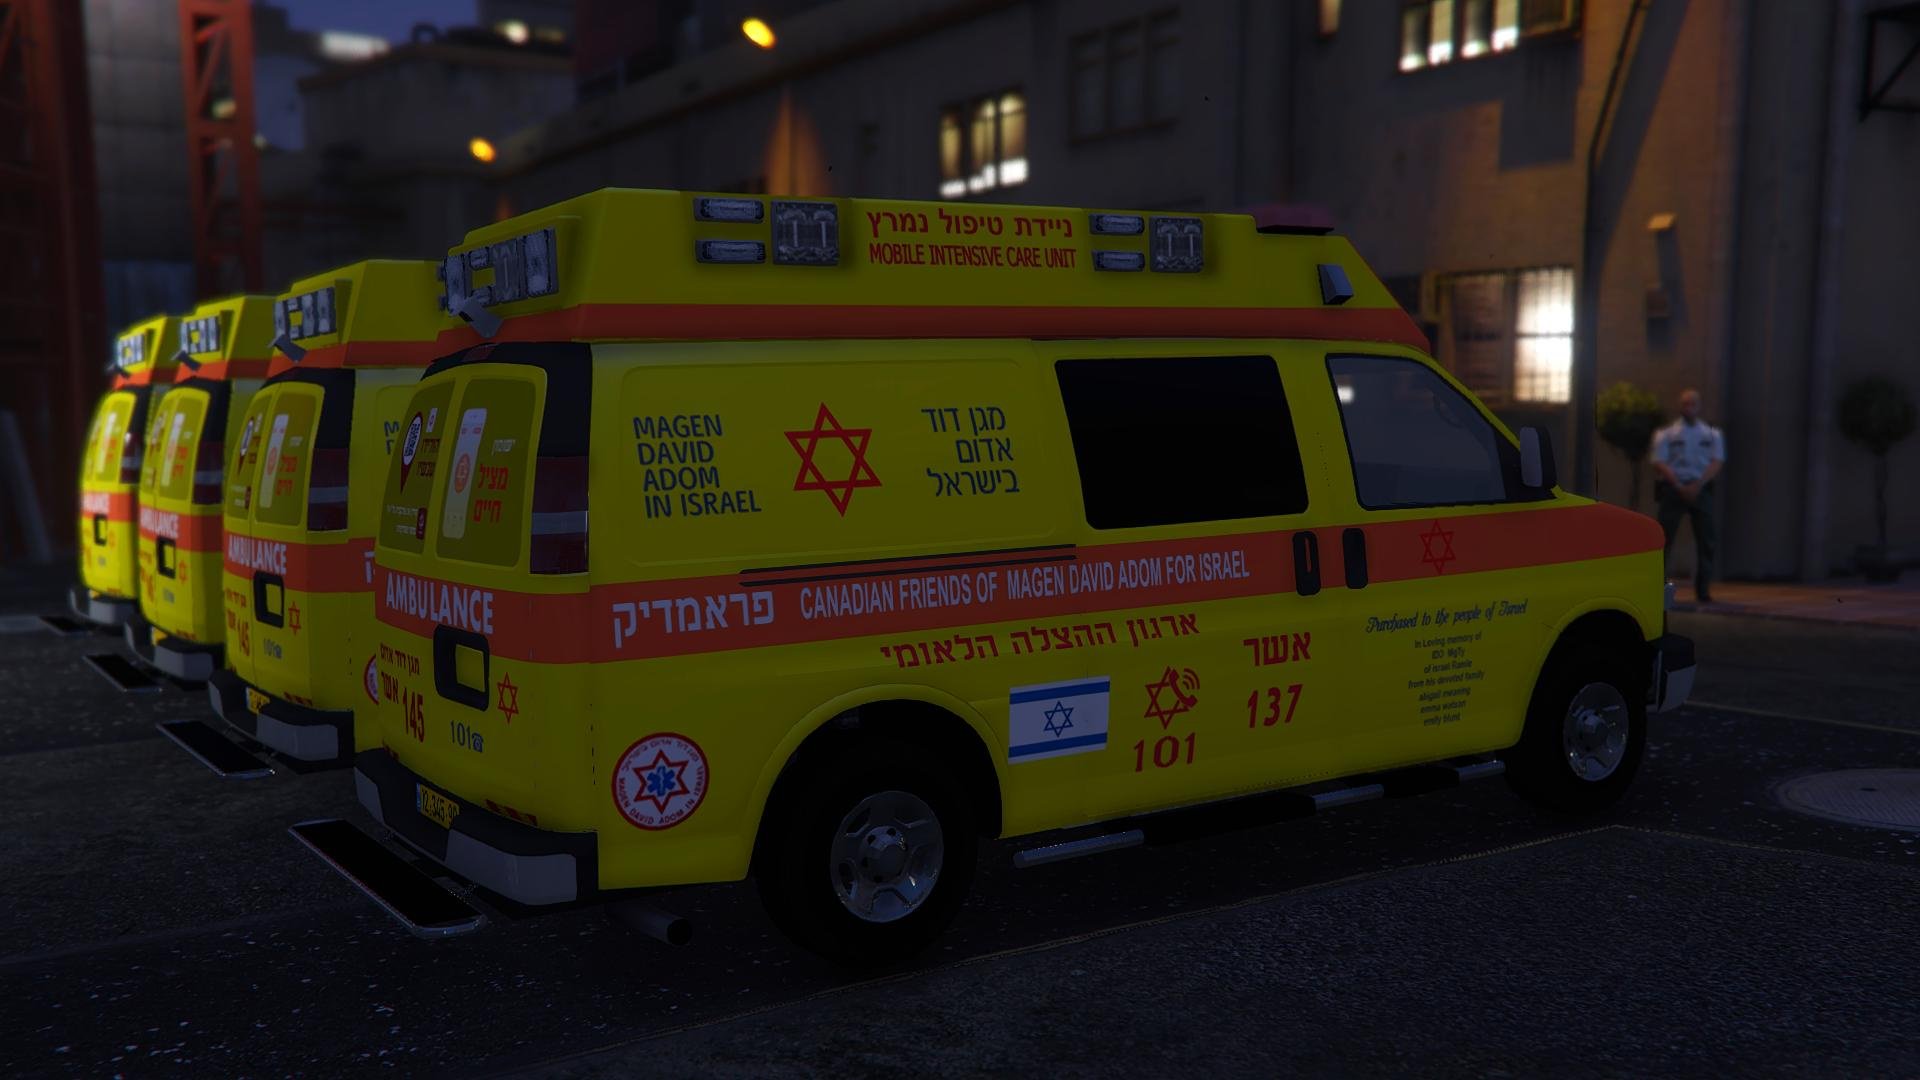 Chevrolet Savana | The New Israeli Ambulance of MAGEN DAVID ADOM